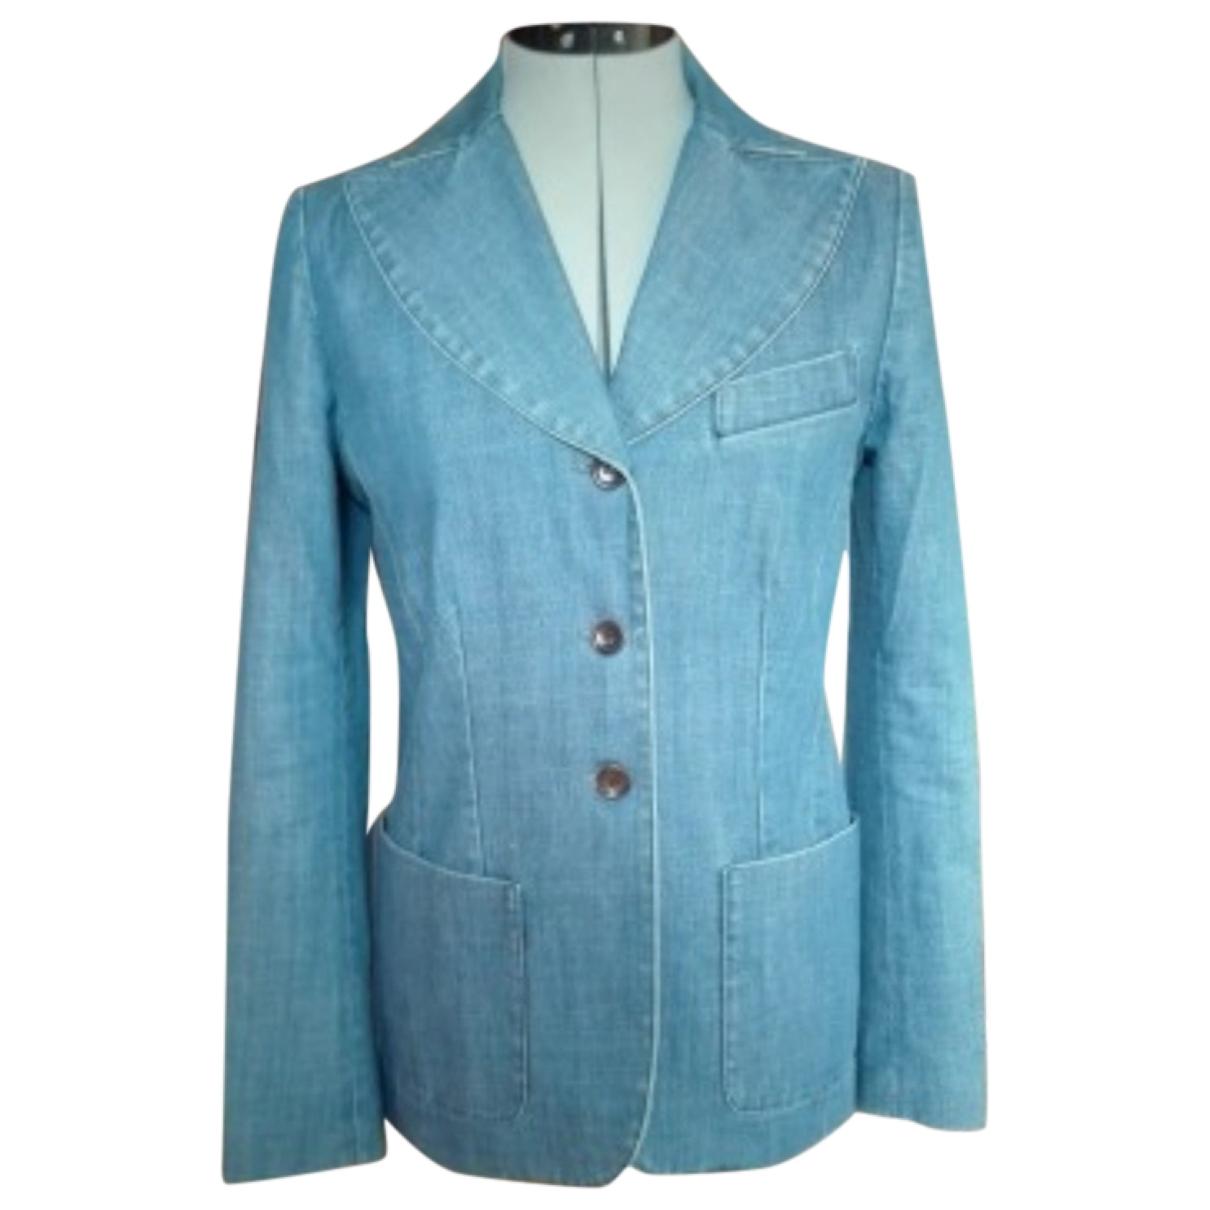 Gerard Darel - Veste   pour femme en denim - bleu